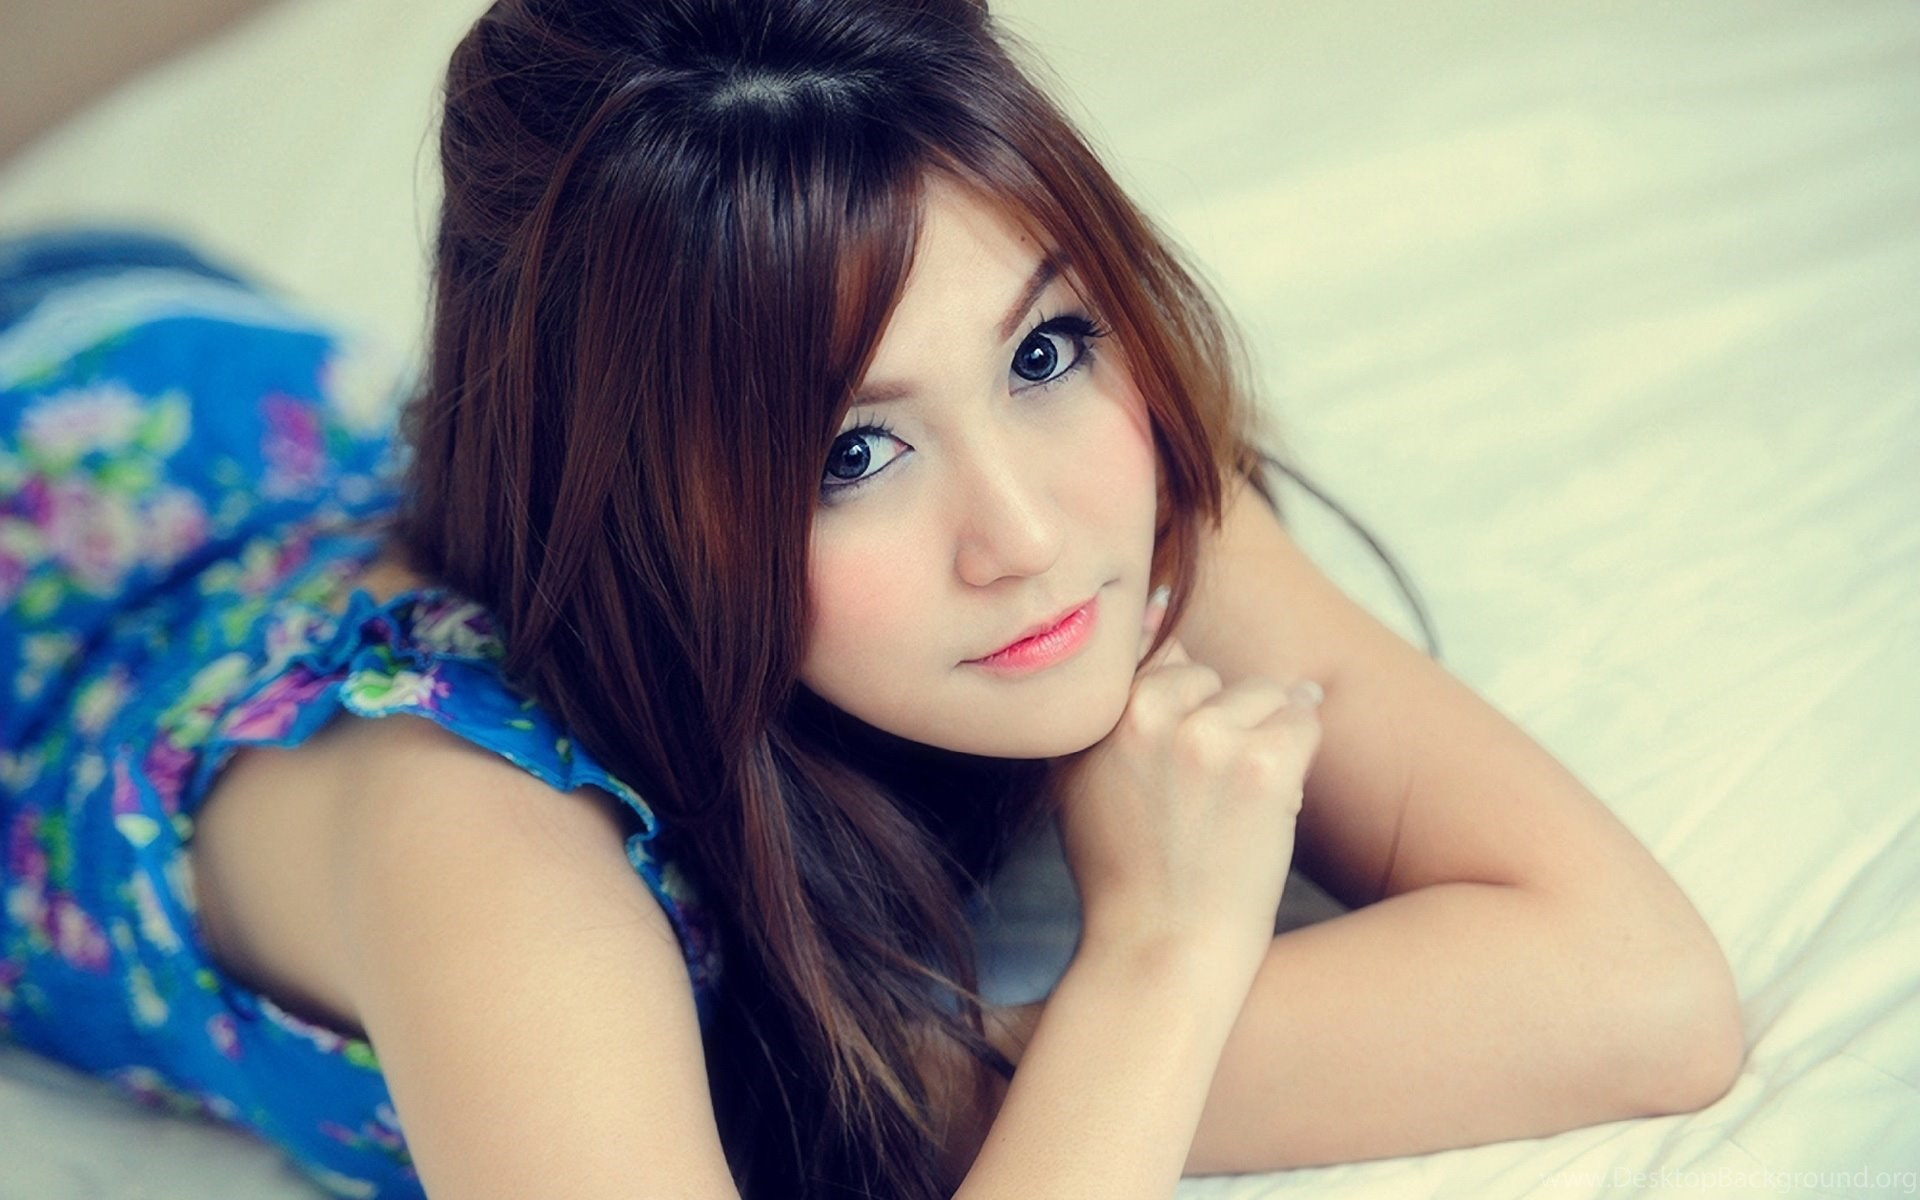 cute girl images wallpapers hd desktop background